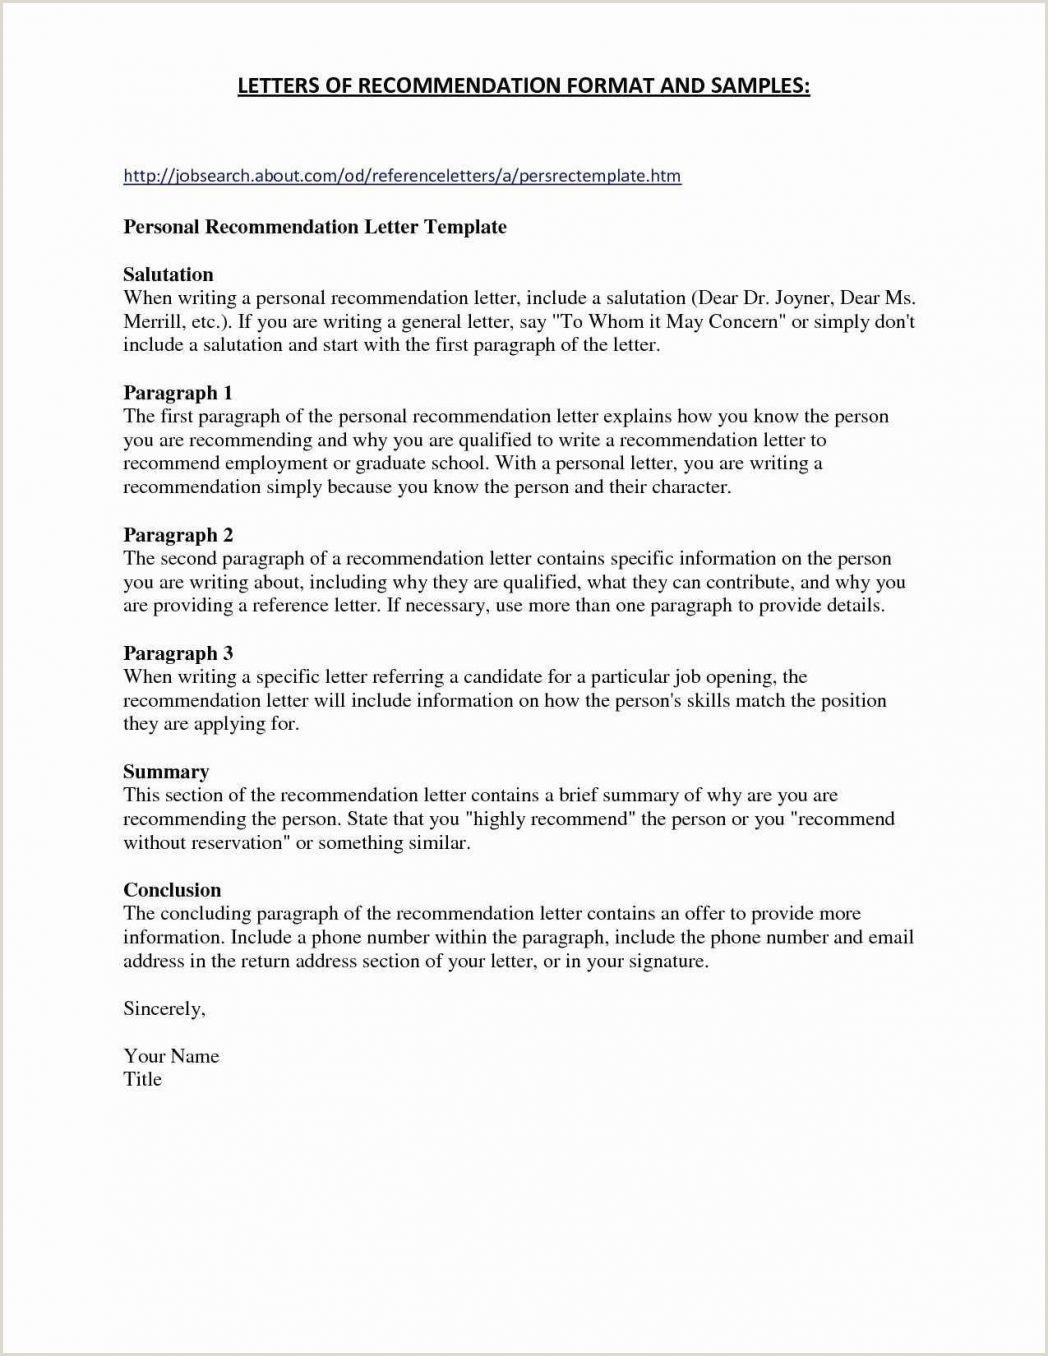 Freshers Resume format Images Standard Cv Hermoso Word Elegant Mac New Outdoor Sample